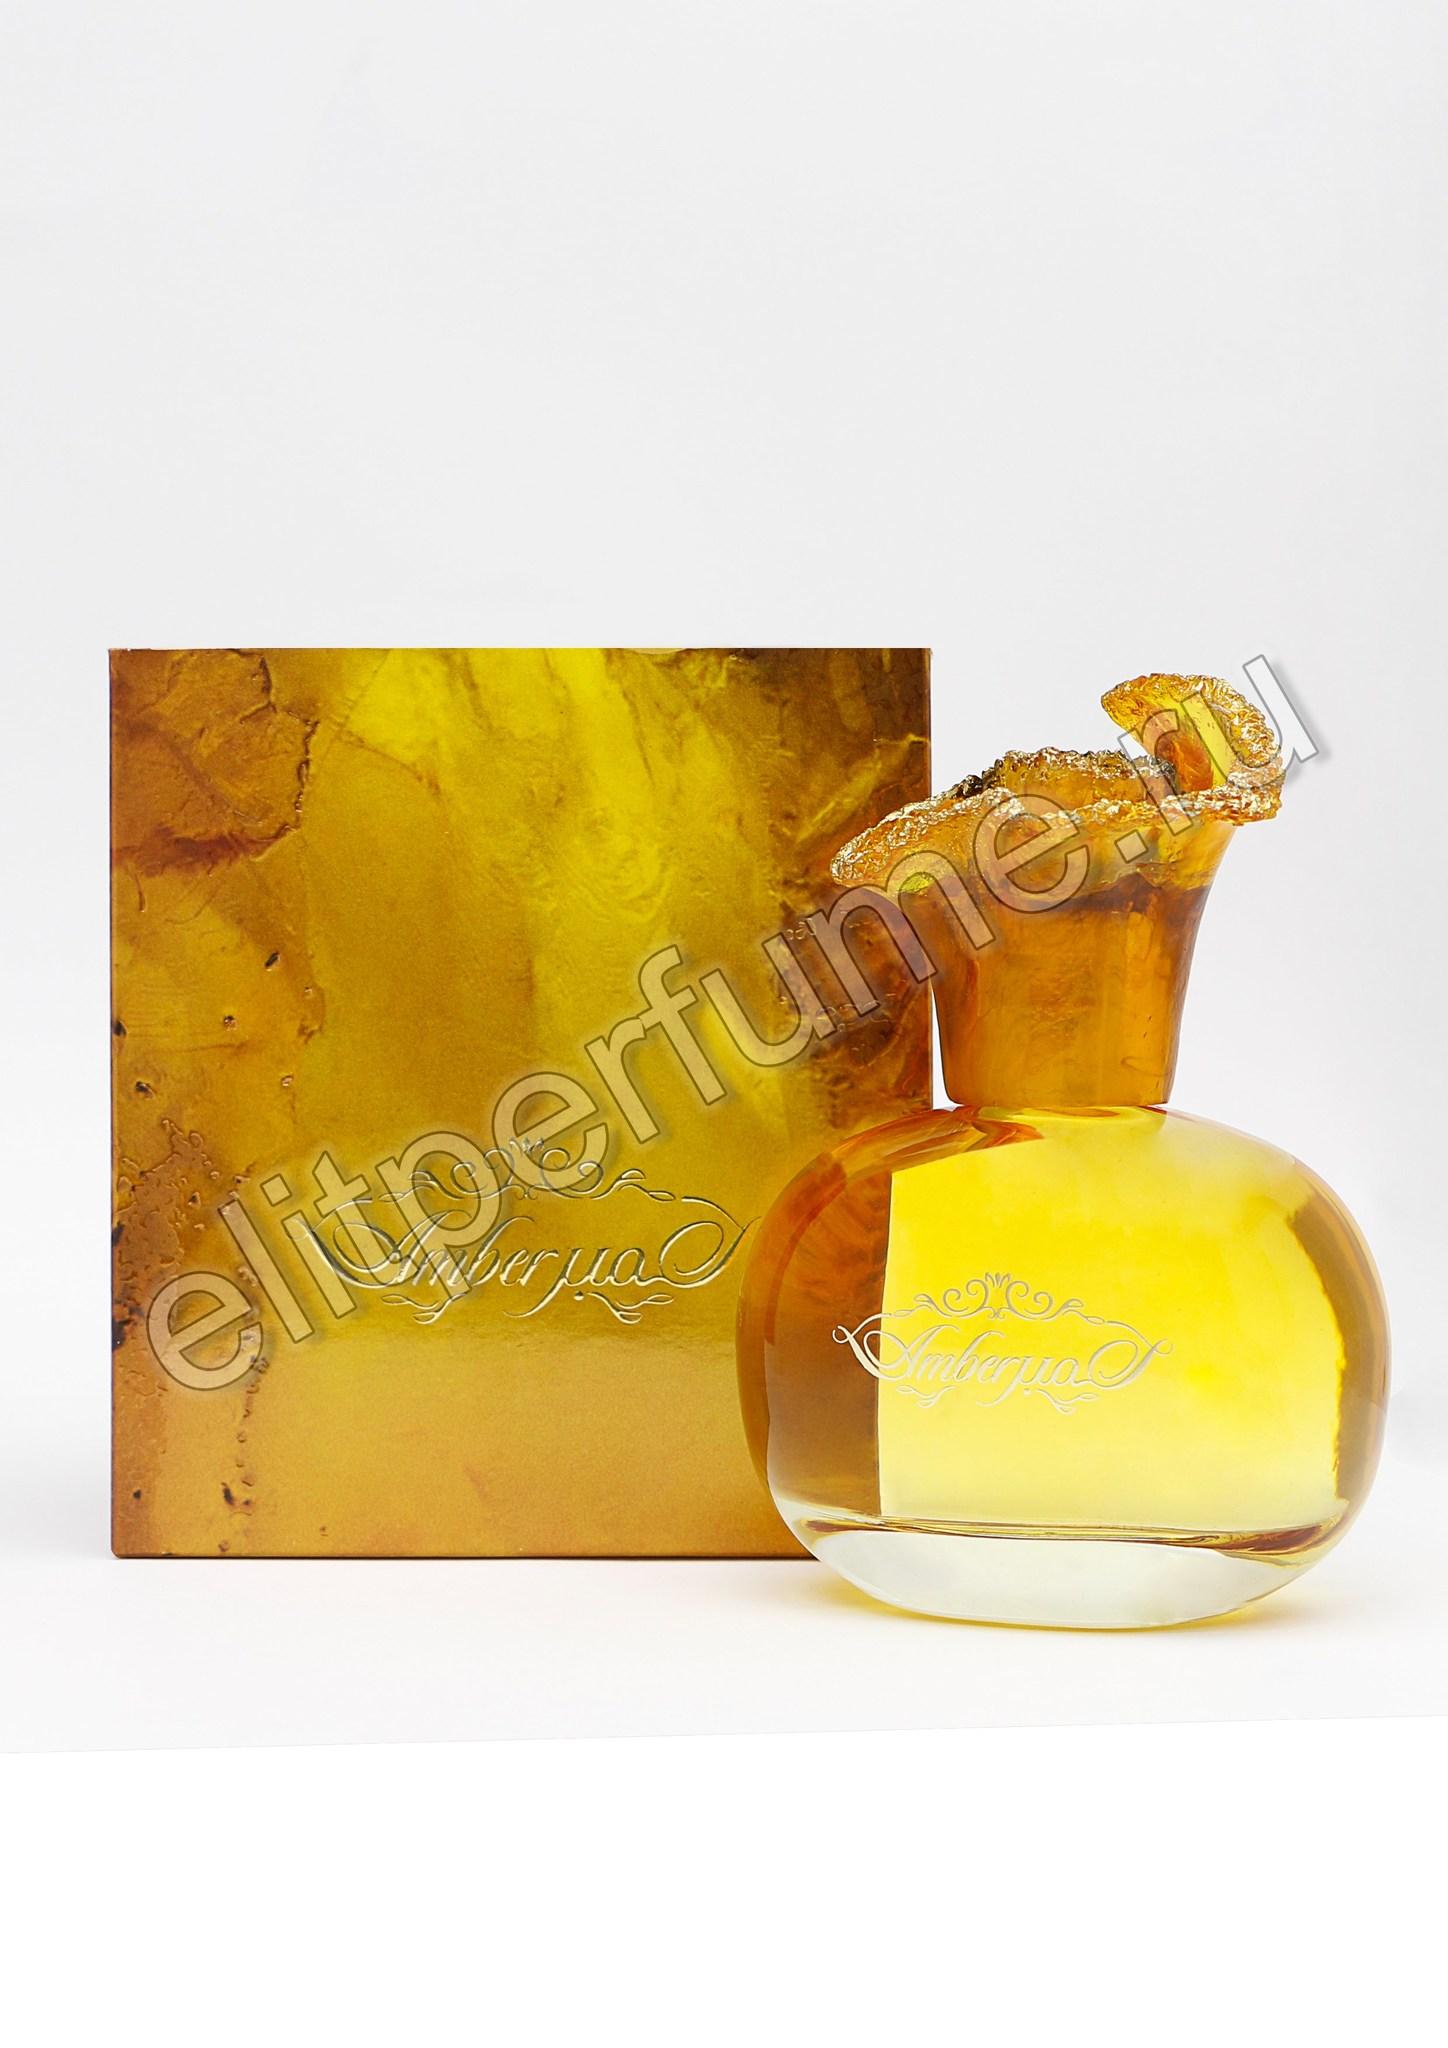 Amber  Янтарный 100 мл  спрей от Саид Джунаид Алам Syed Junaid Alam